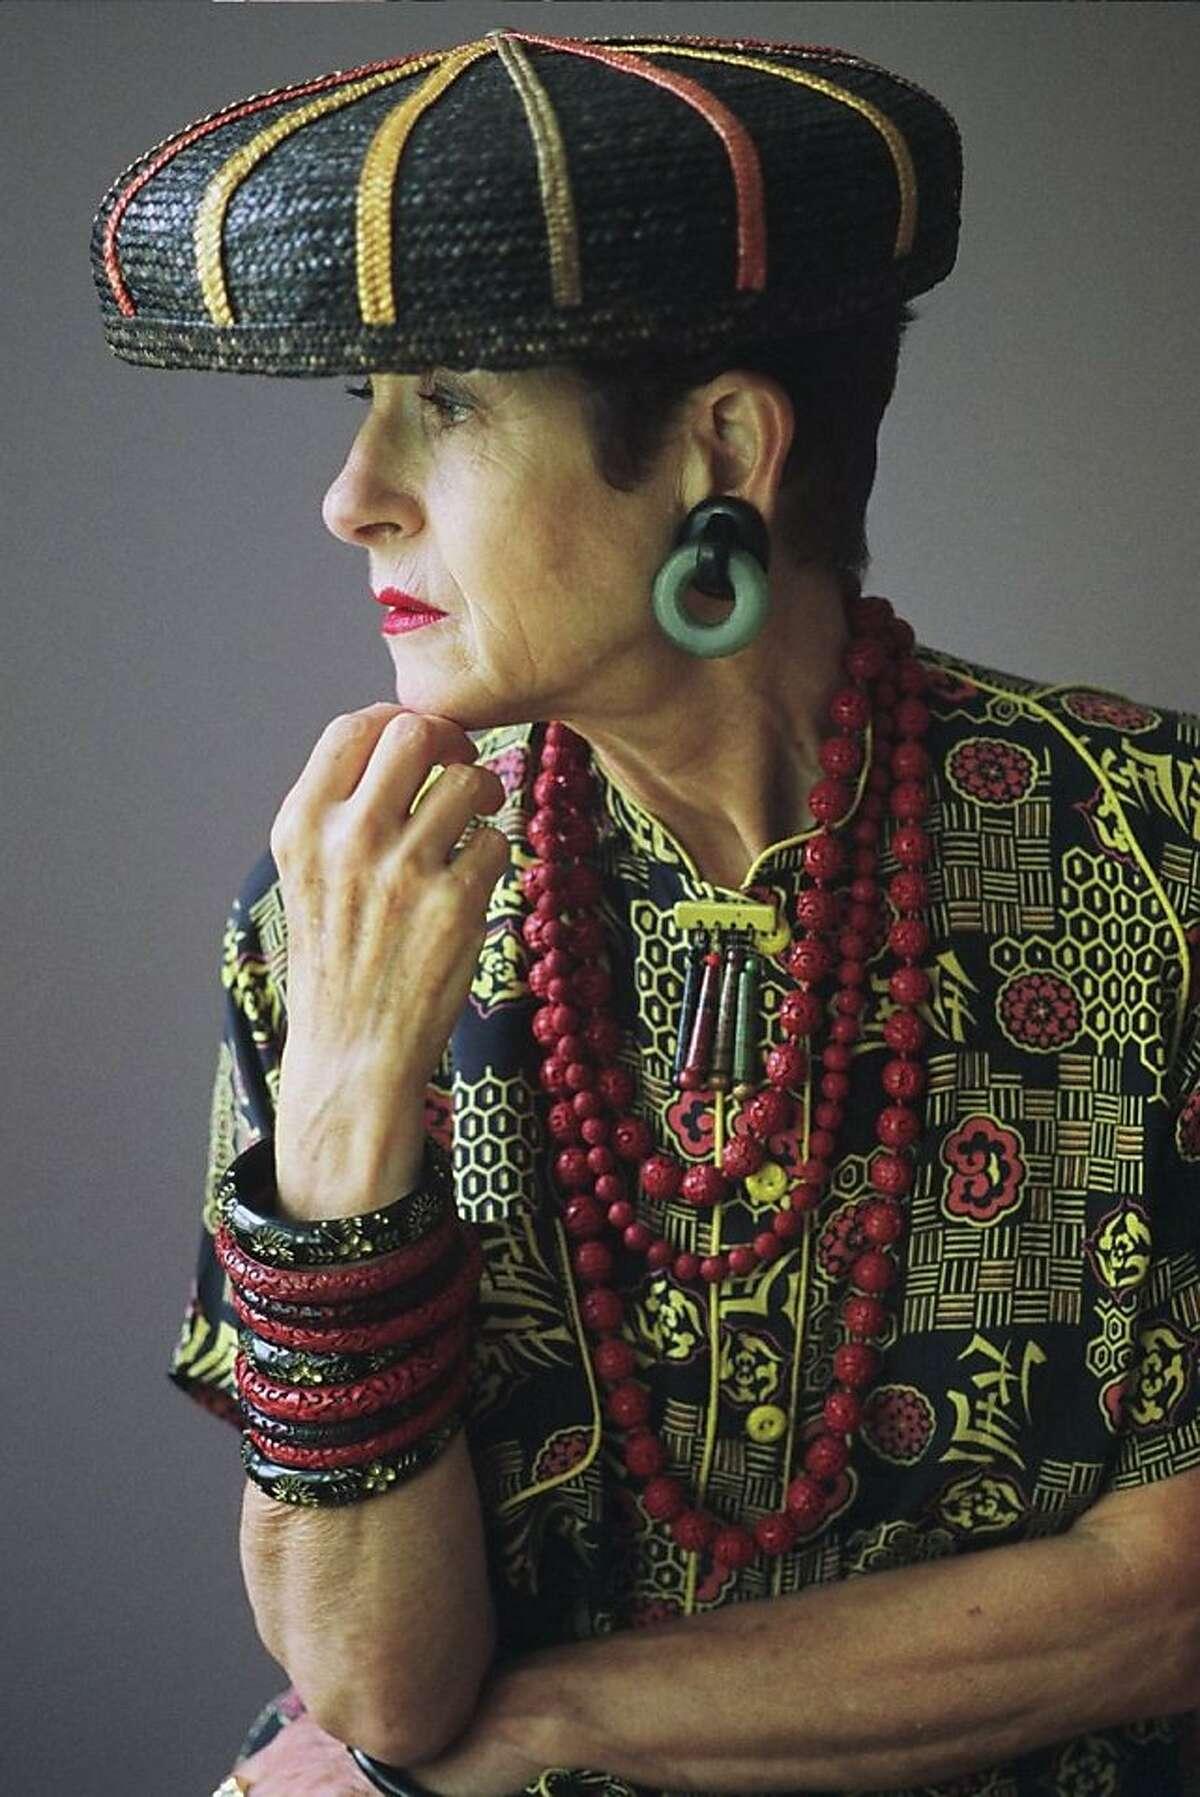 New Yorker Tziporah Salamon, a favorite photo subject of Bill Cunningham, will be teaching her